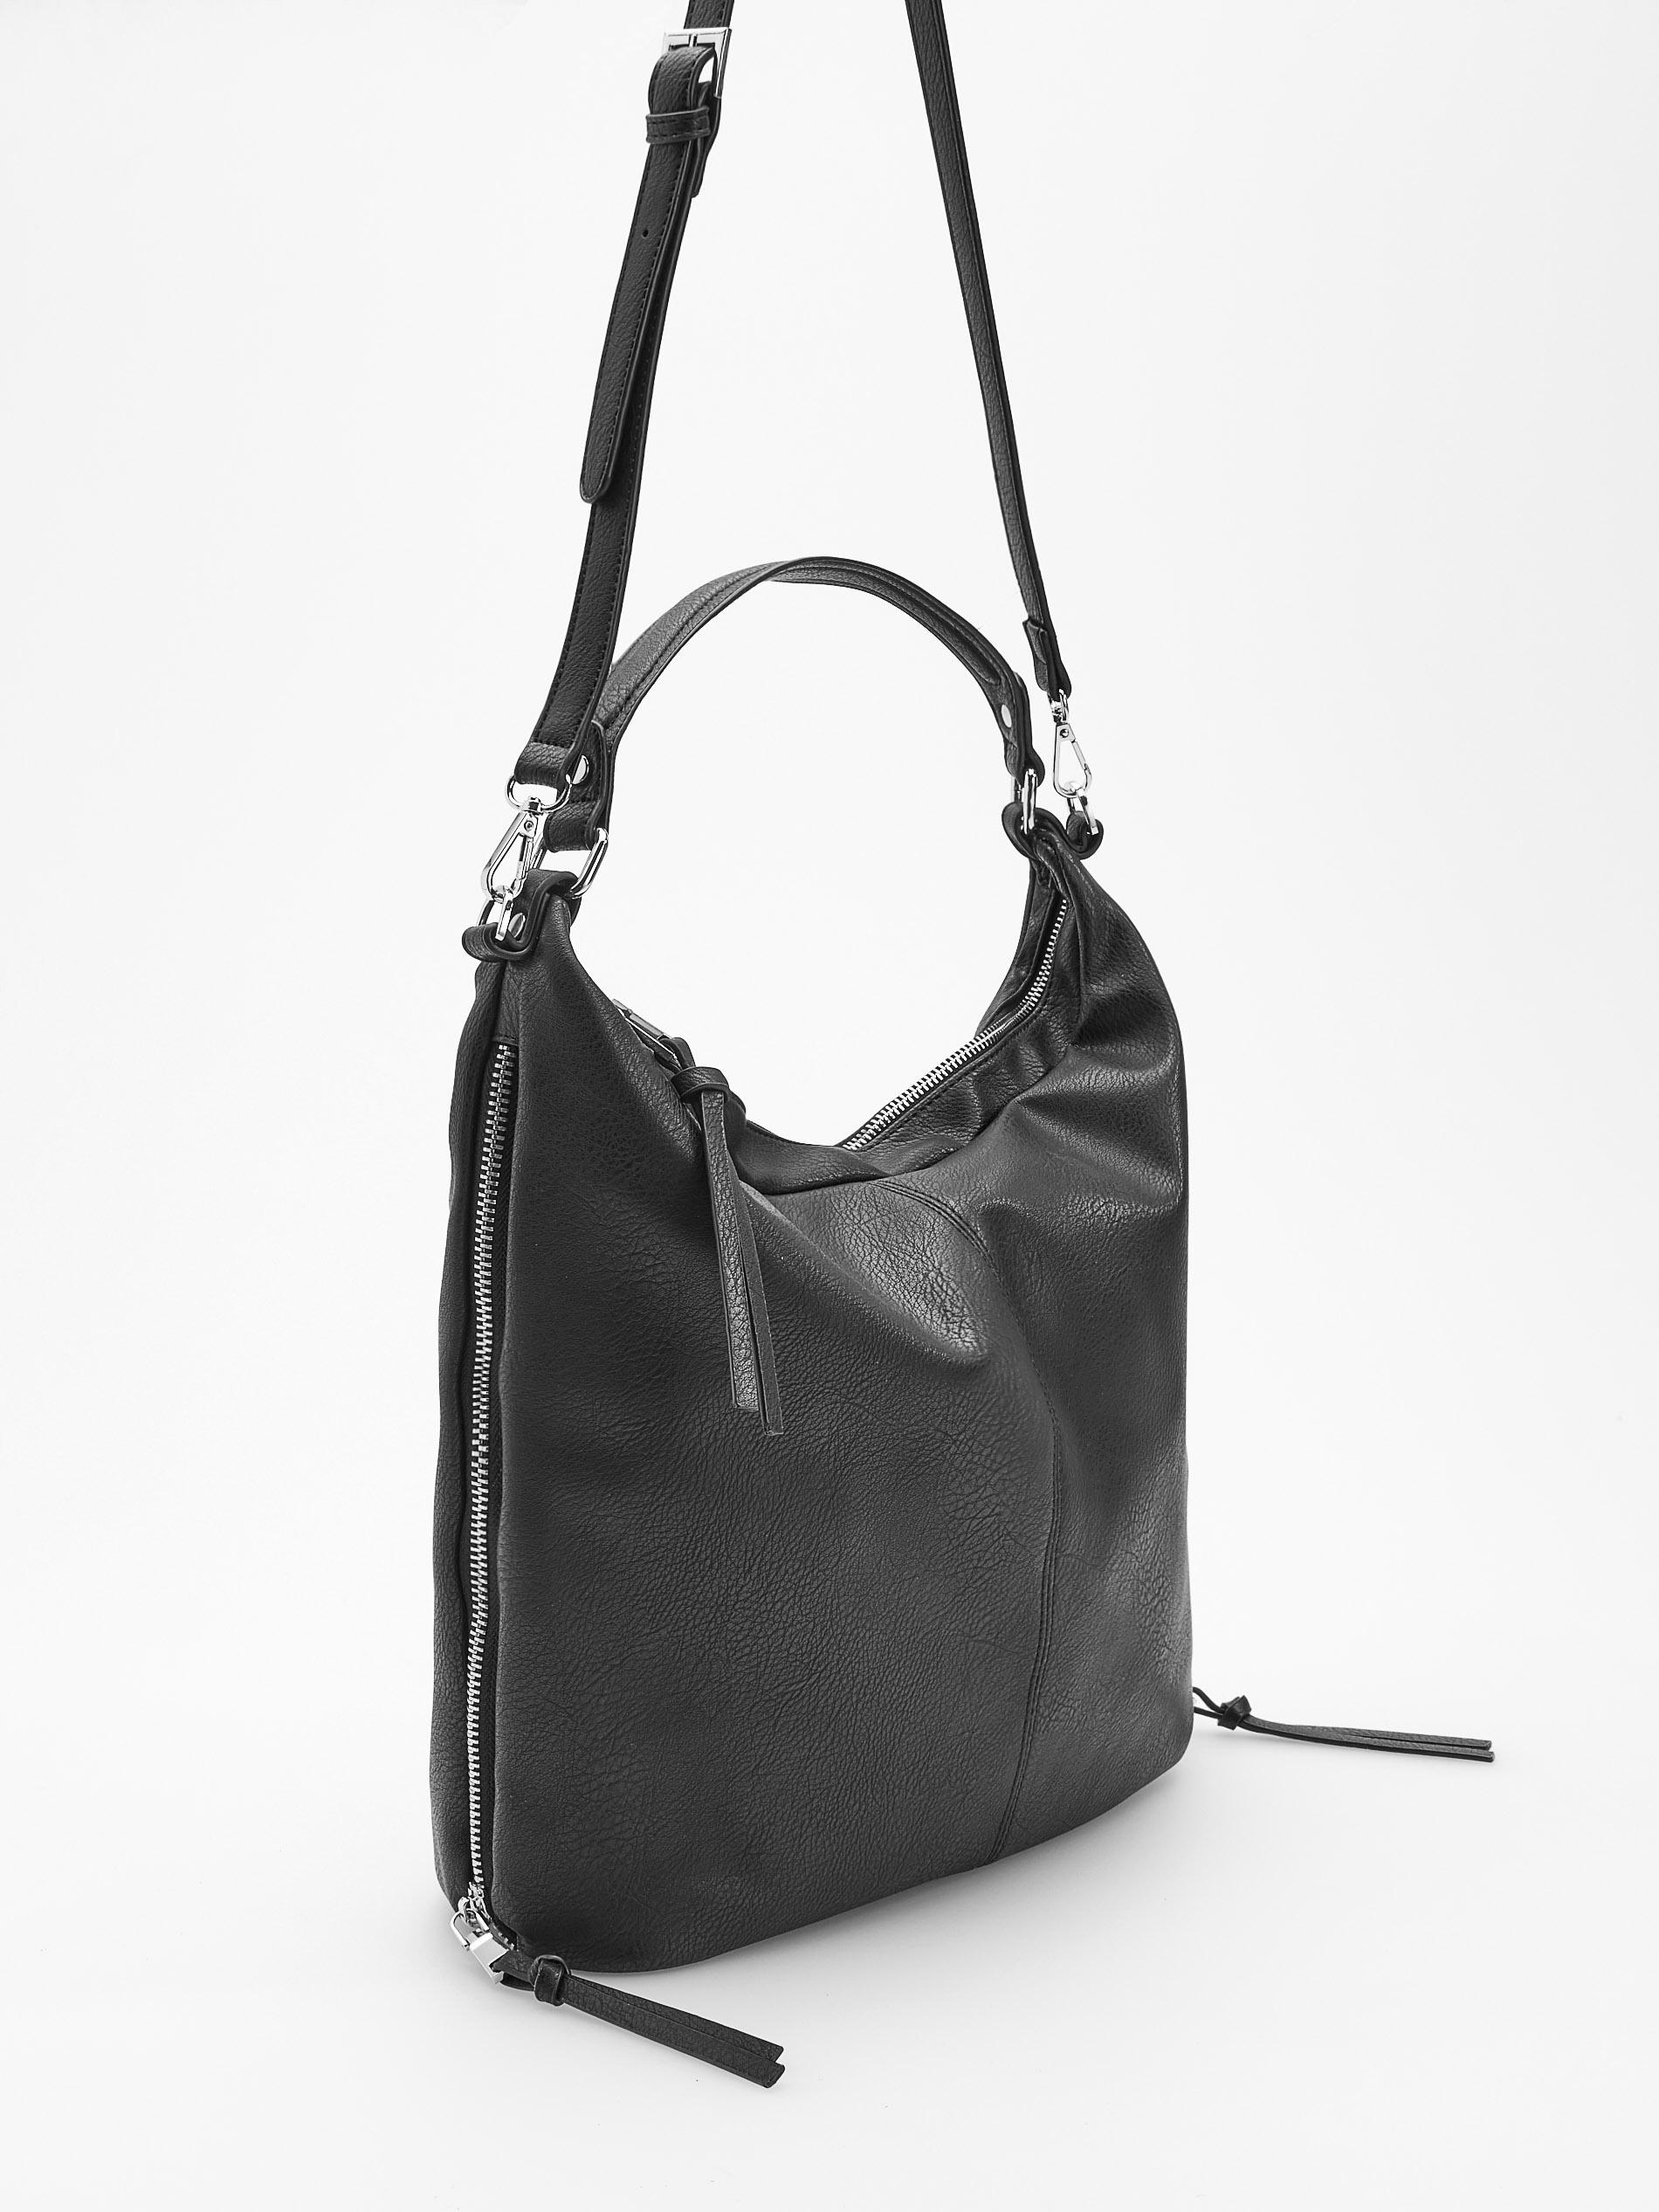 9aab9035b41e4 Czarna torebka do ręki i na pasku Reserved zamki - 7721310227 ...